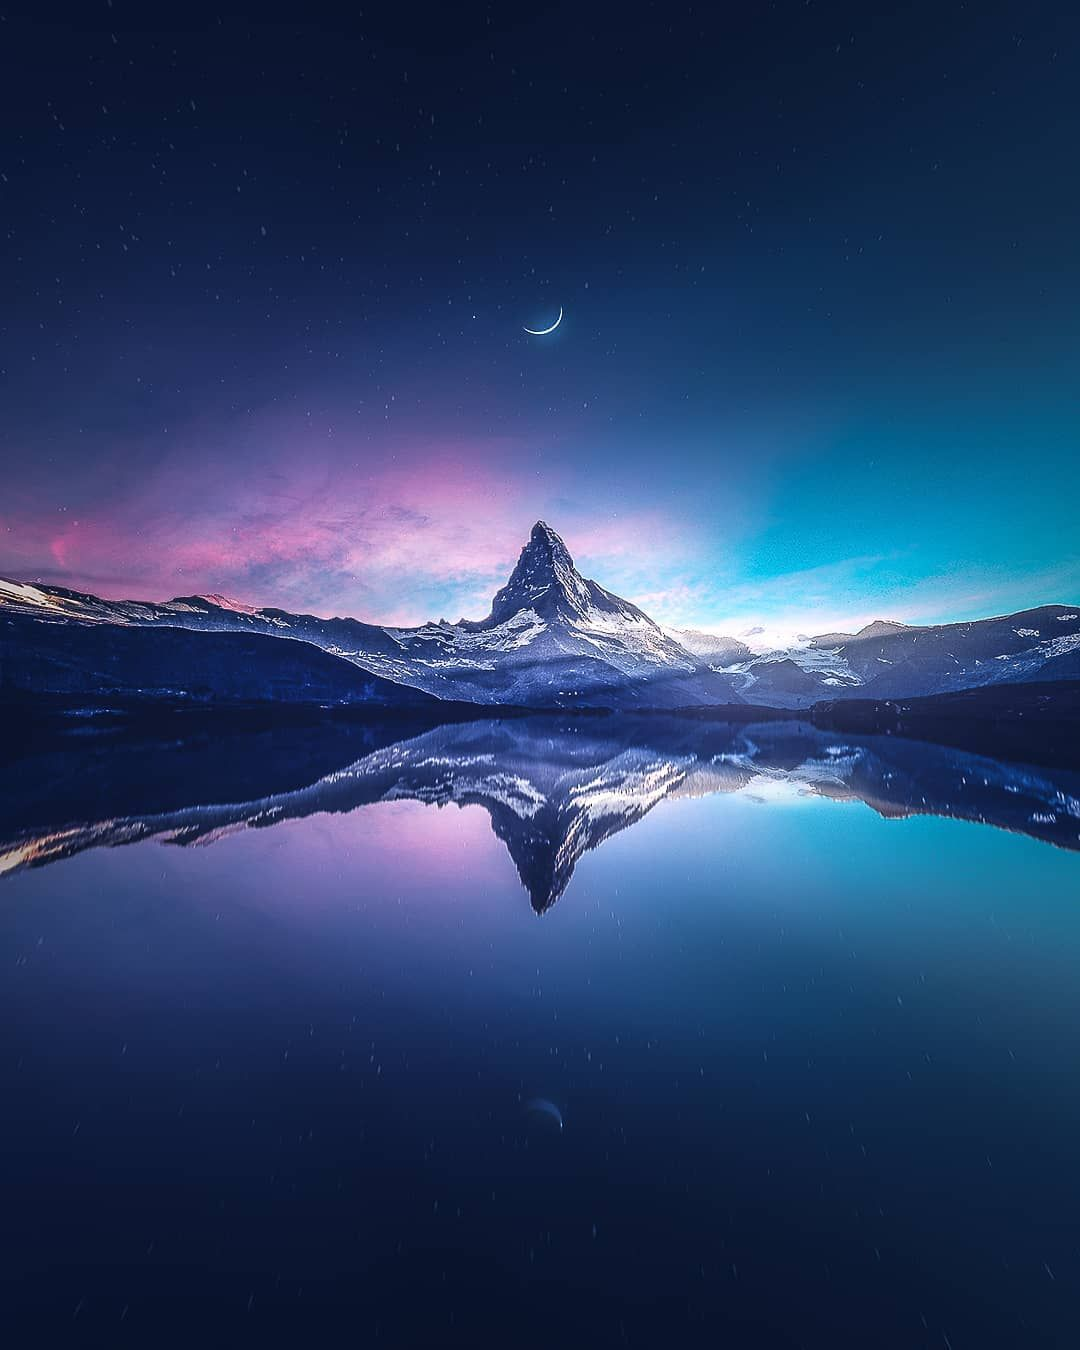 Pure Zermattmatterhorn Glacier In Switzerland Artofvisuals Photoshop Lightroom Adobe Earthpix Fine Art Fotos De Paisagem Wallpaper Paisagem